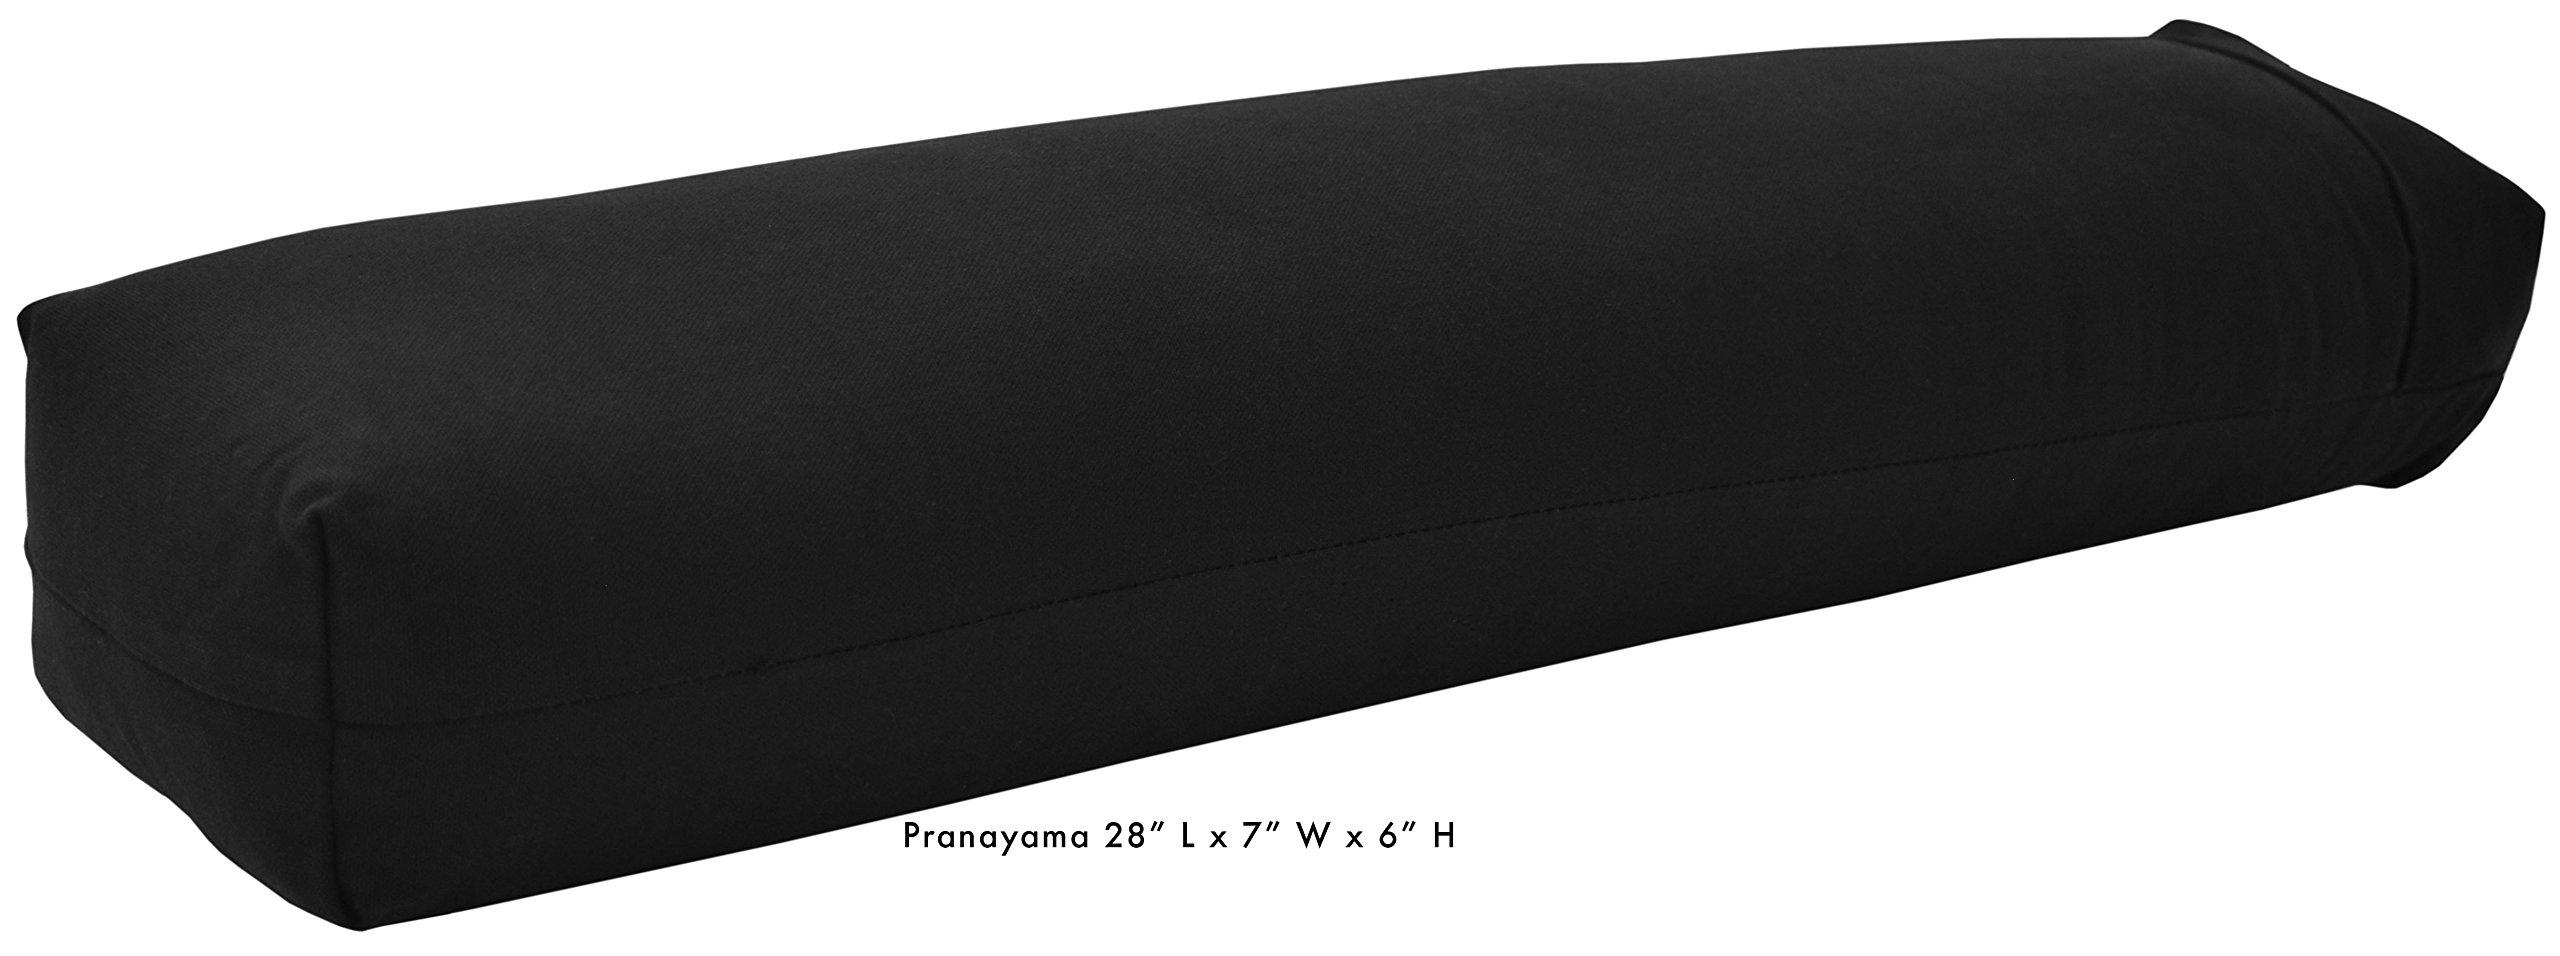 Bean Products Pranayama Yoga Bolster - Cotton - Black